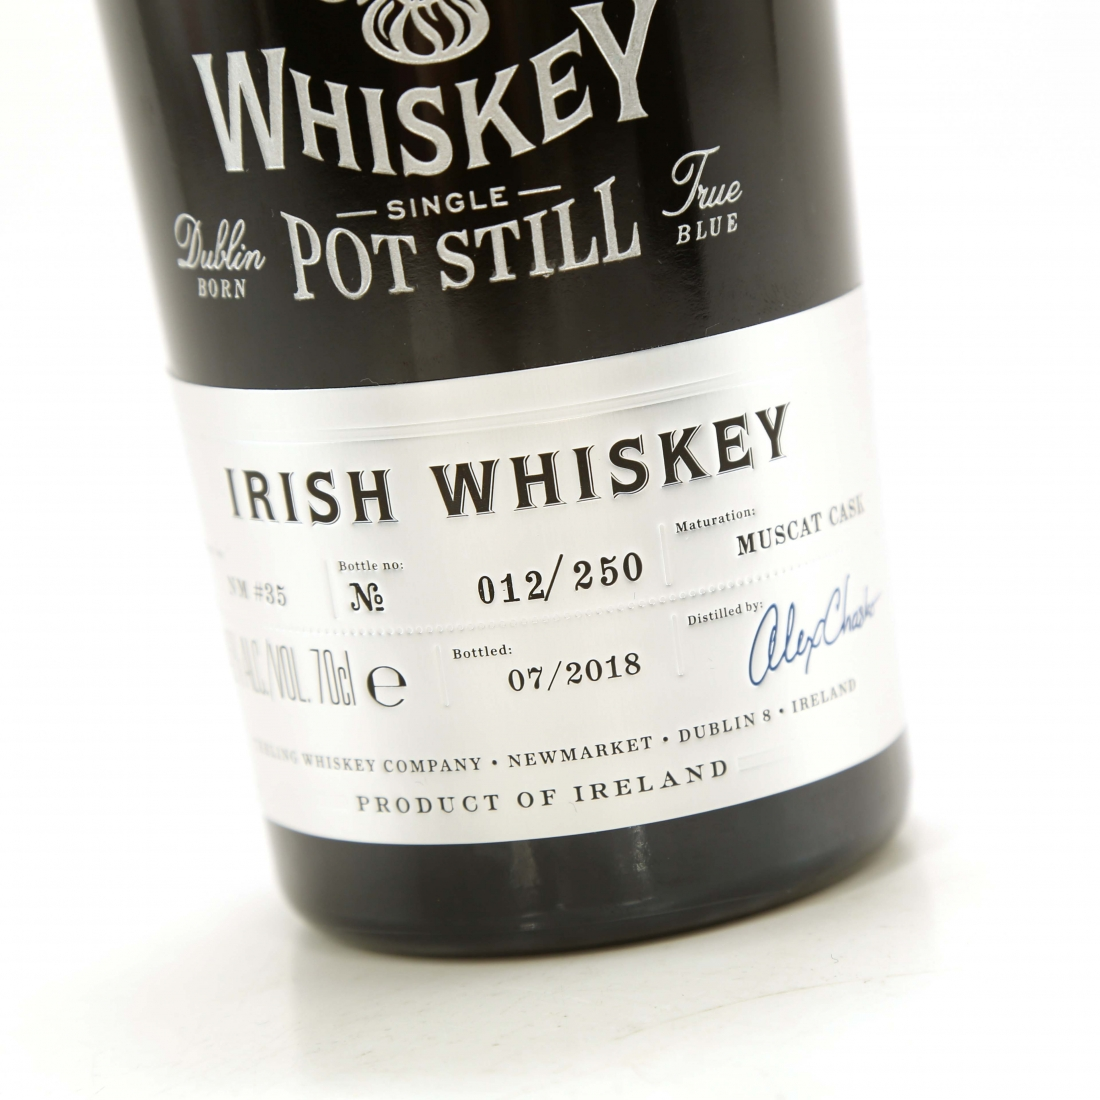 Teeling Celebratory Single Pot Still Whiskey / Bottle #012